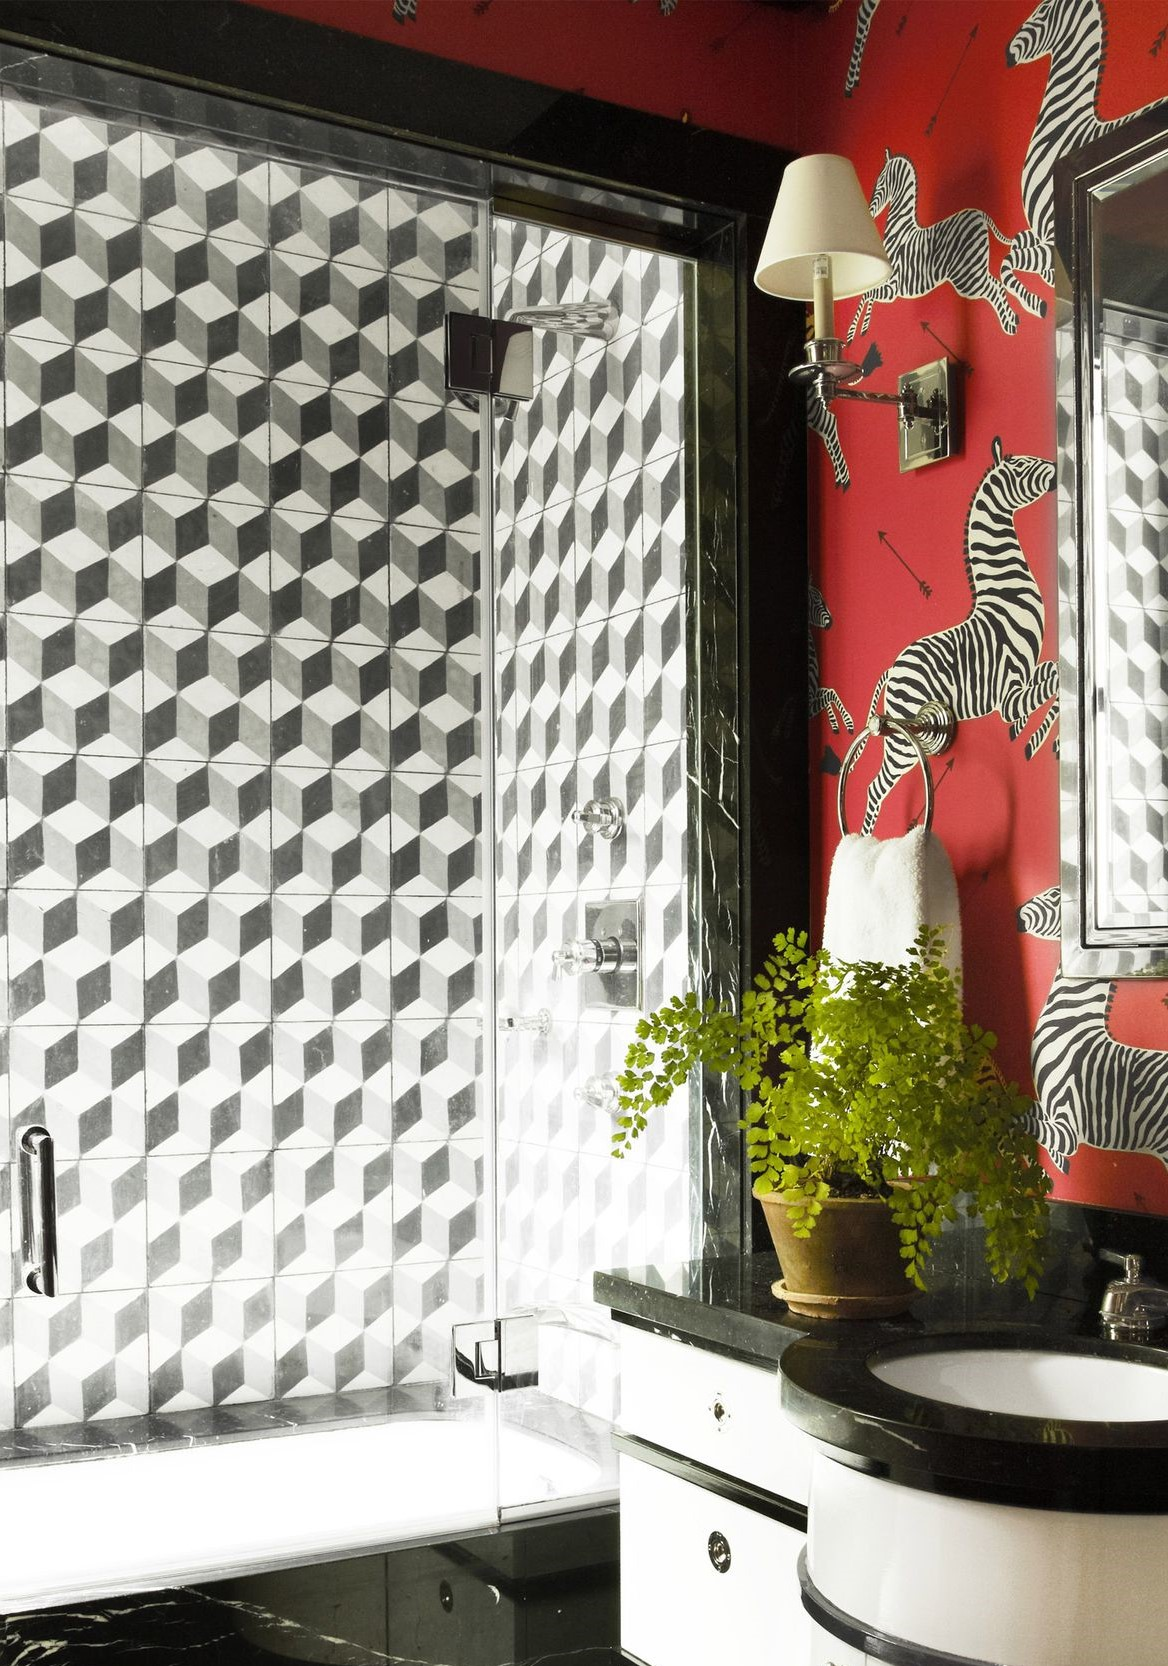 bathroom tile design Eye-Catching Bathroom Tile Design Ideas graphic tile design ideas 1